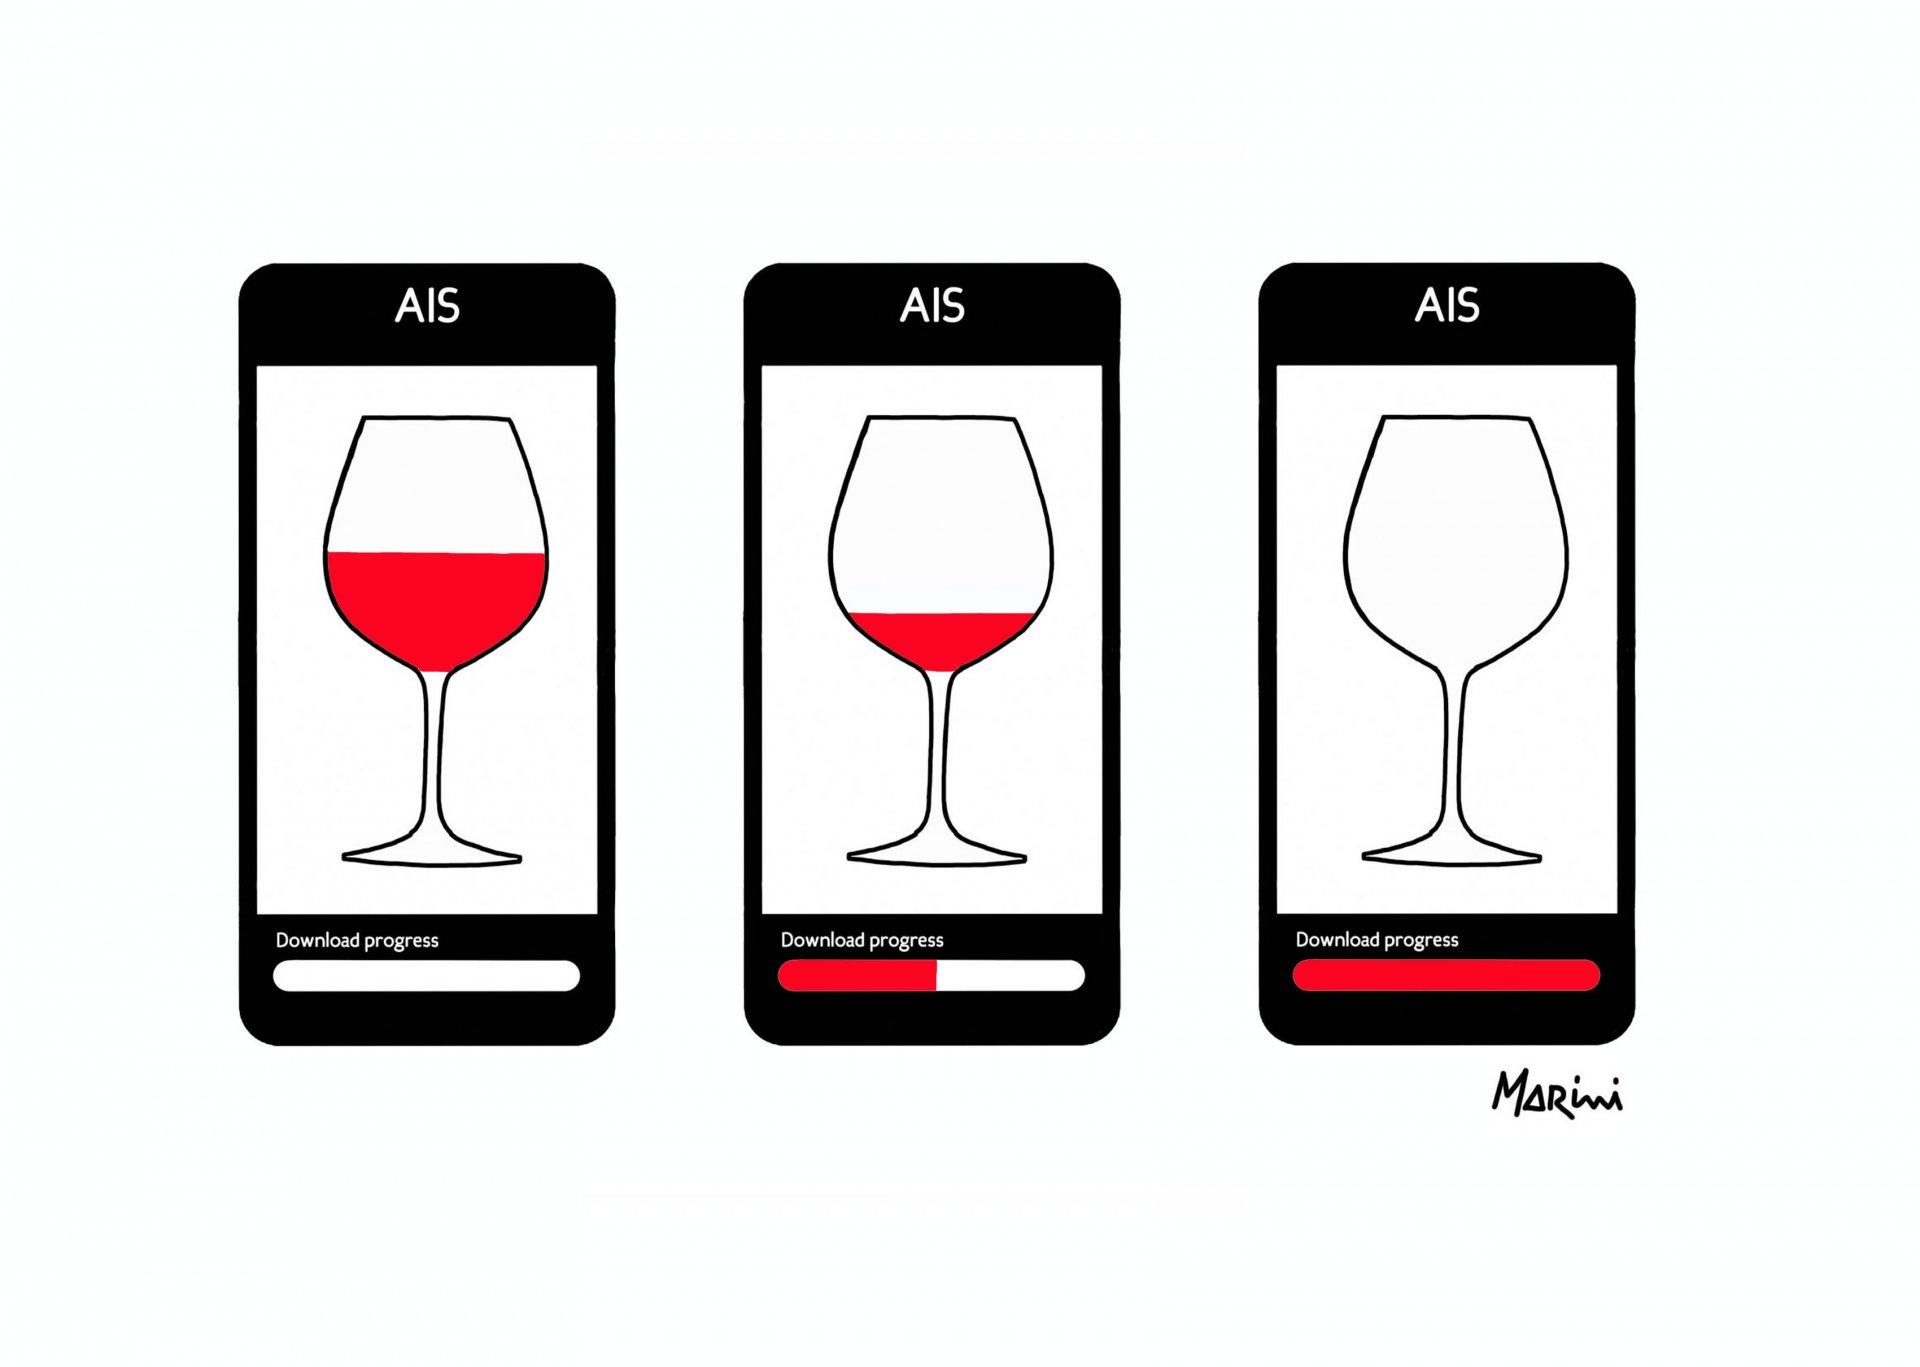 Vitae, la guida ai vini italiani di Ais diventa App